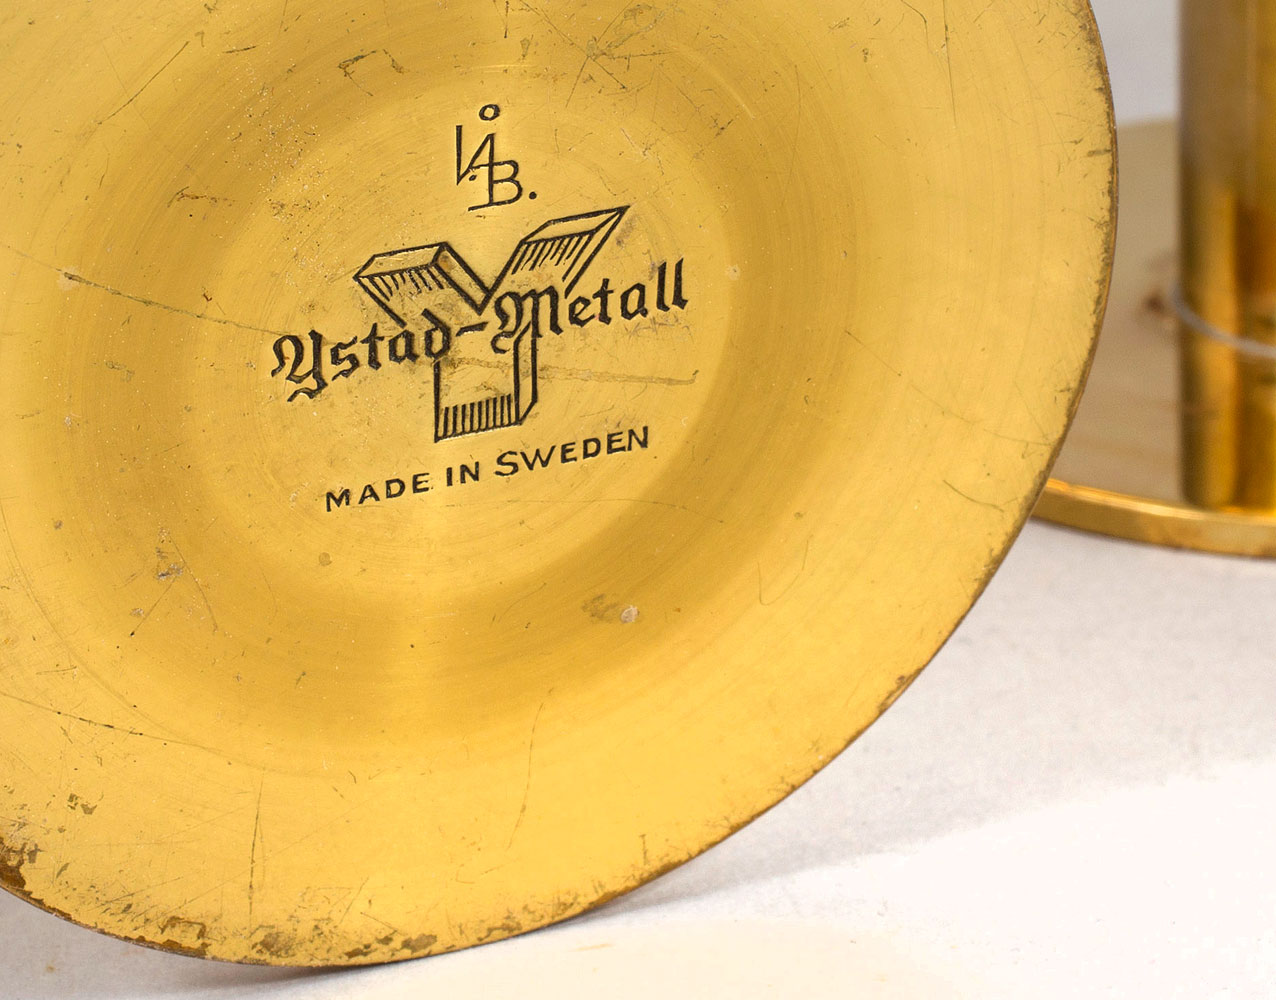 Candelabros Liljan de Ivar Alenius Bjork por Ystad-Metall